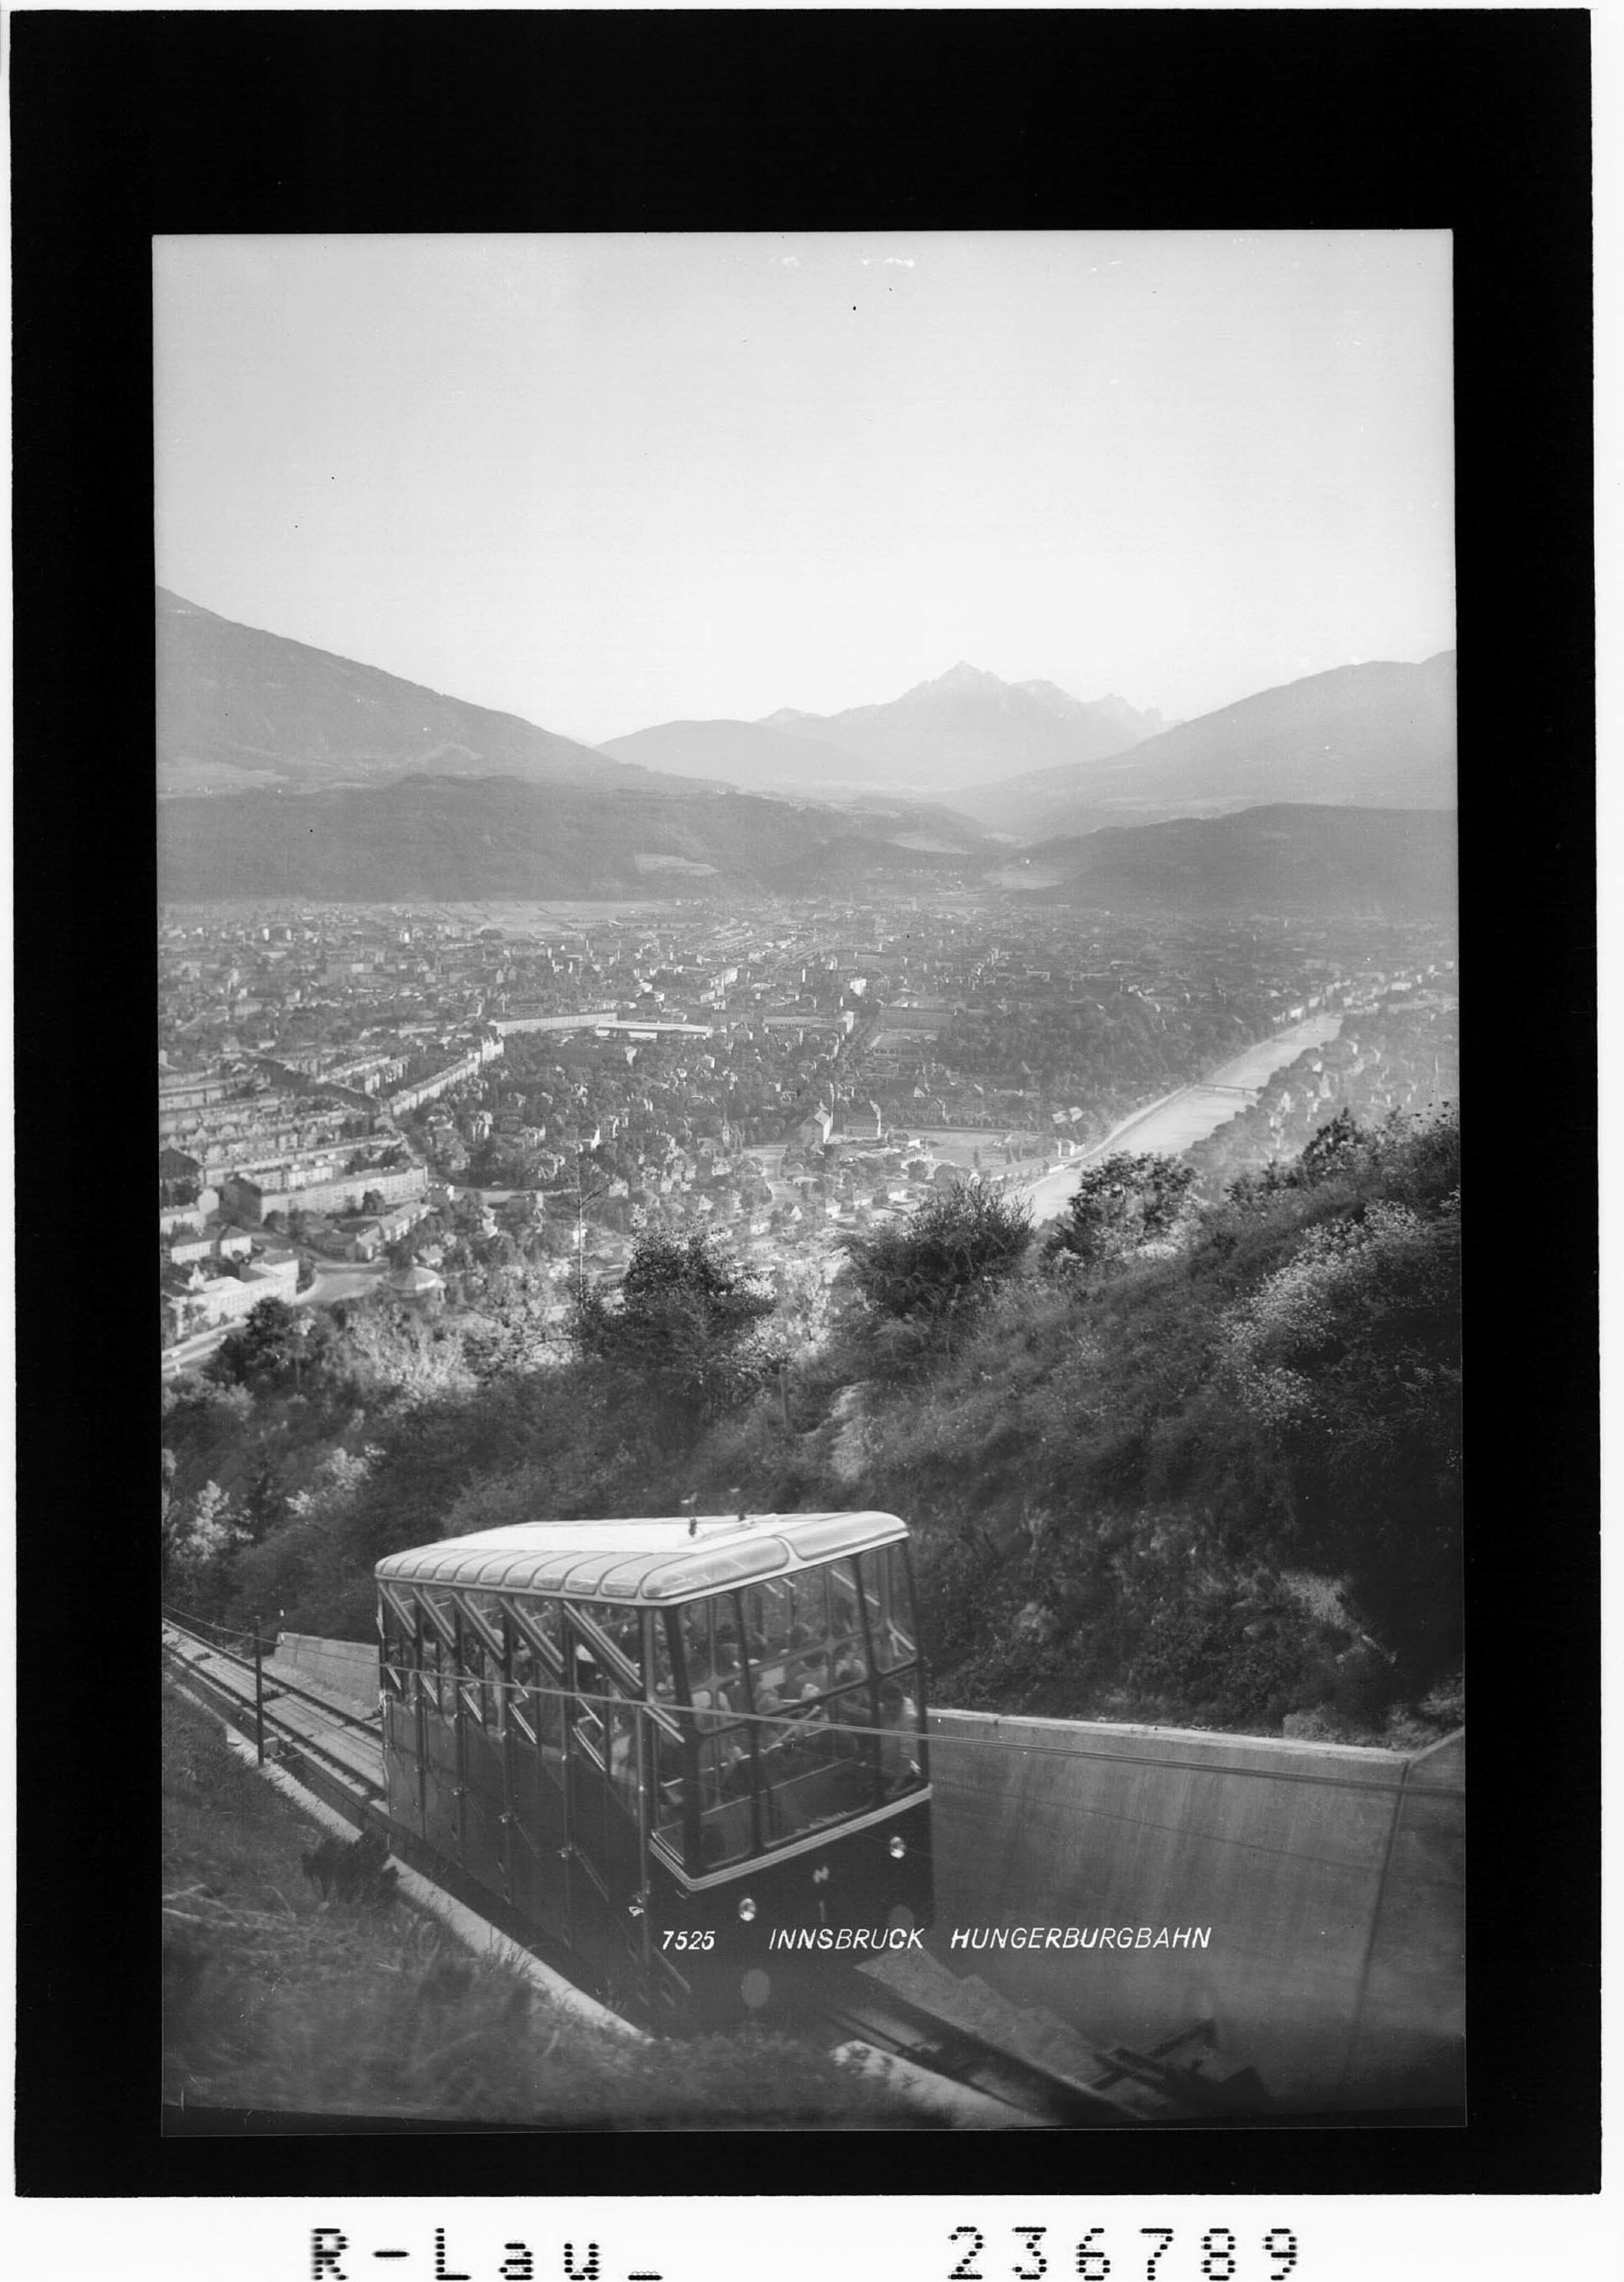 Innsbruck / Hungerburgbahn von Rhomberg